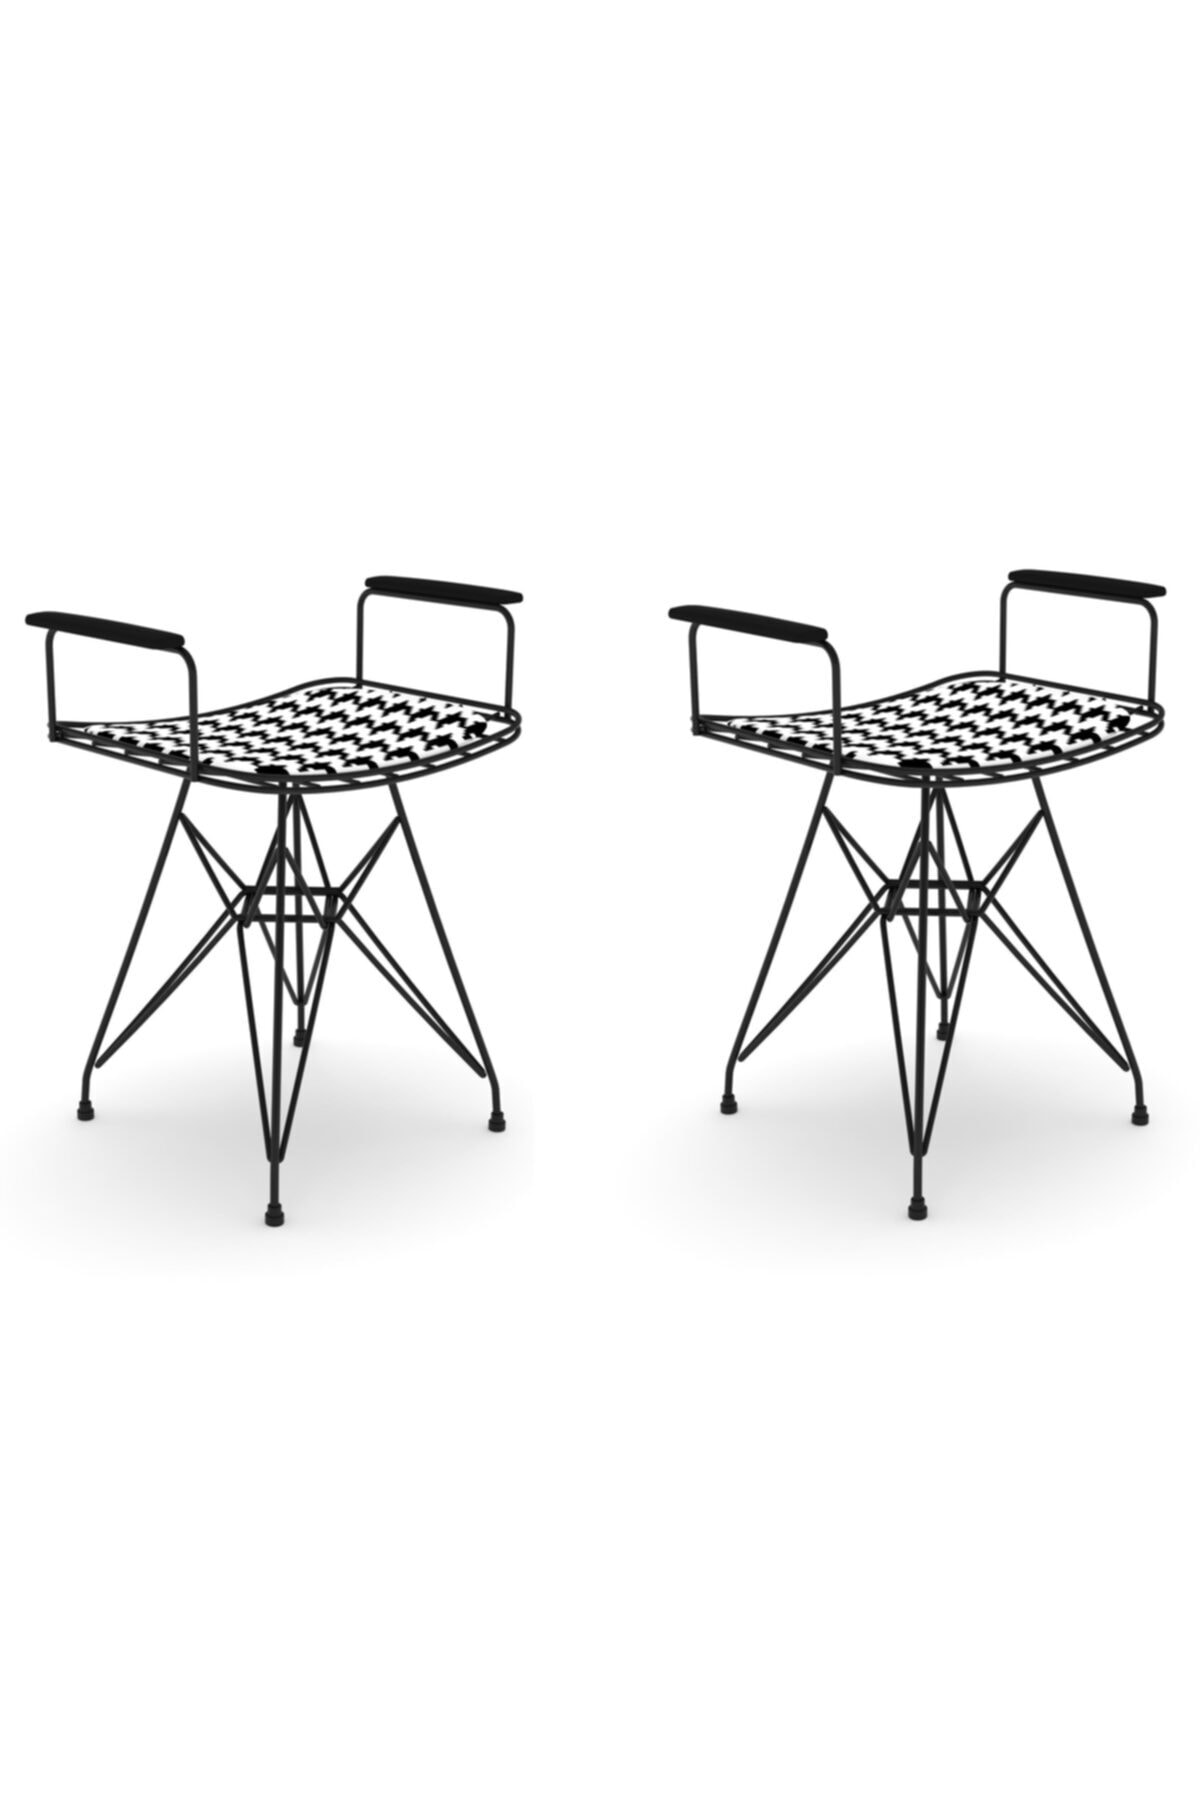 Knsz Kafes Tel Sandalyesi Tabure 2 Li Mutlu Syhkono Kolçaklı Ofis Cafe Bahçe Mutfak